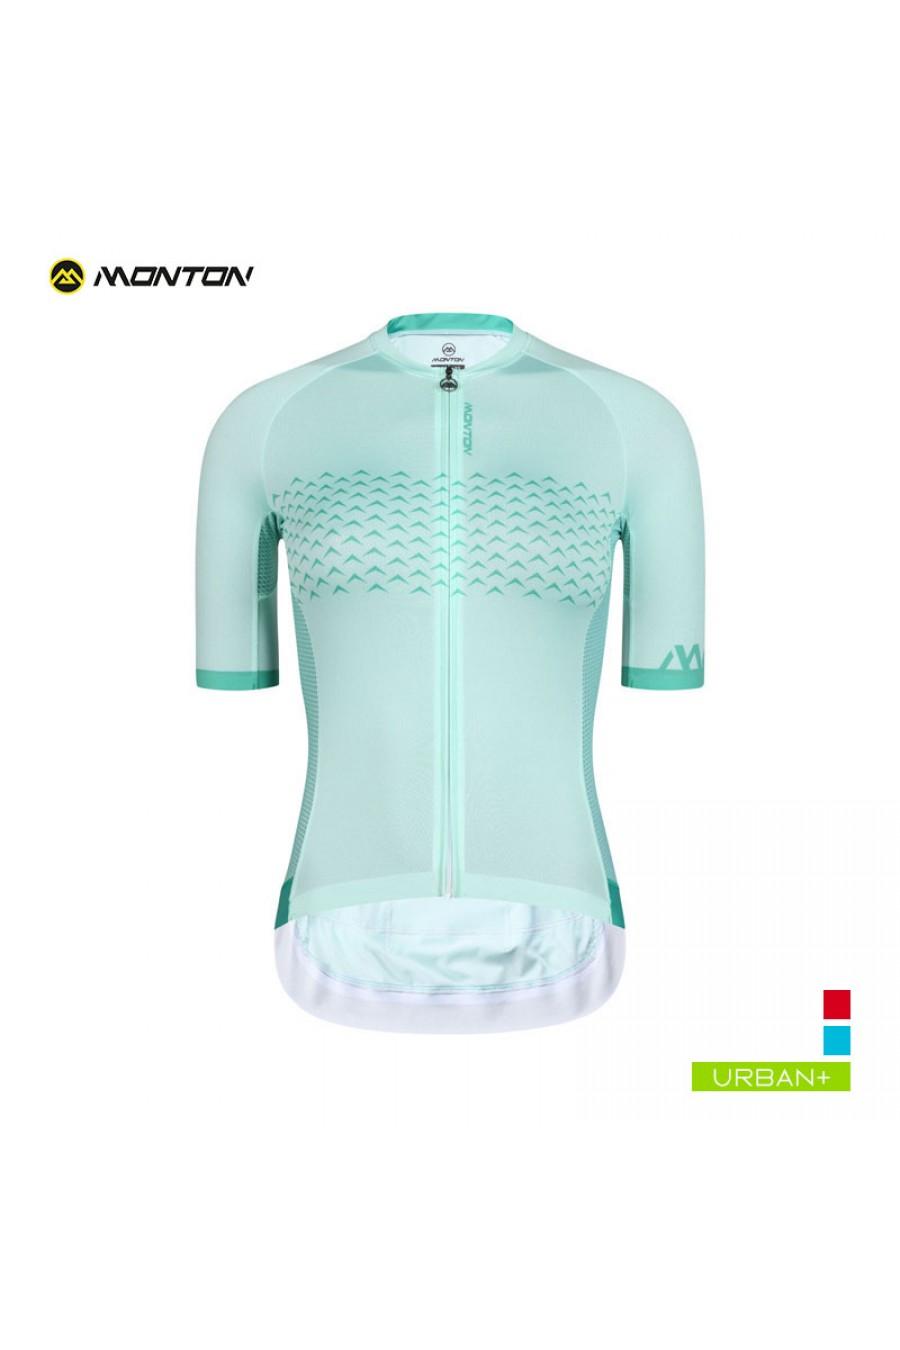 ab17690f0 Buy Women s Lightweight Short Sleeve Cycling Jersey Green Online